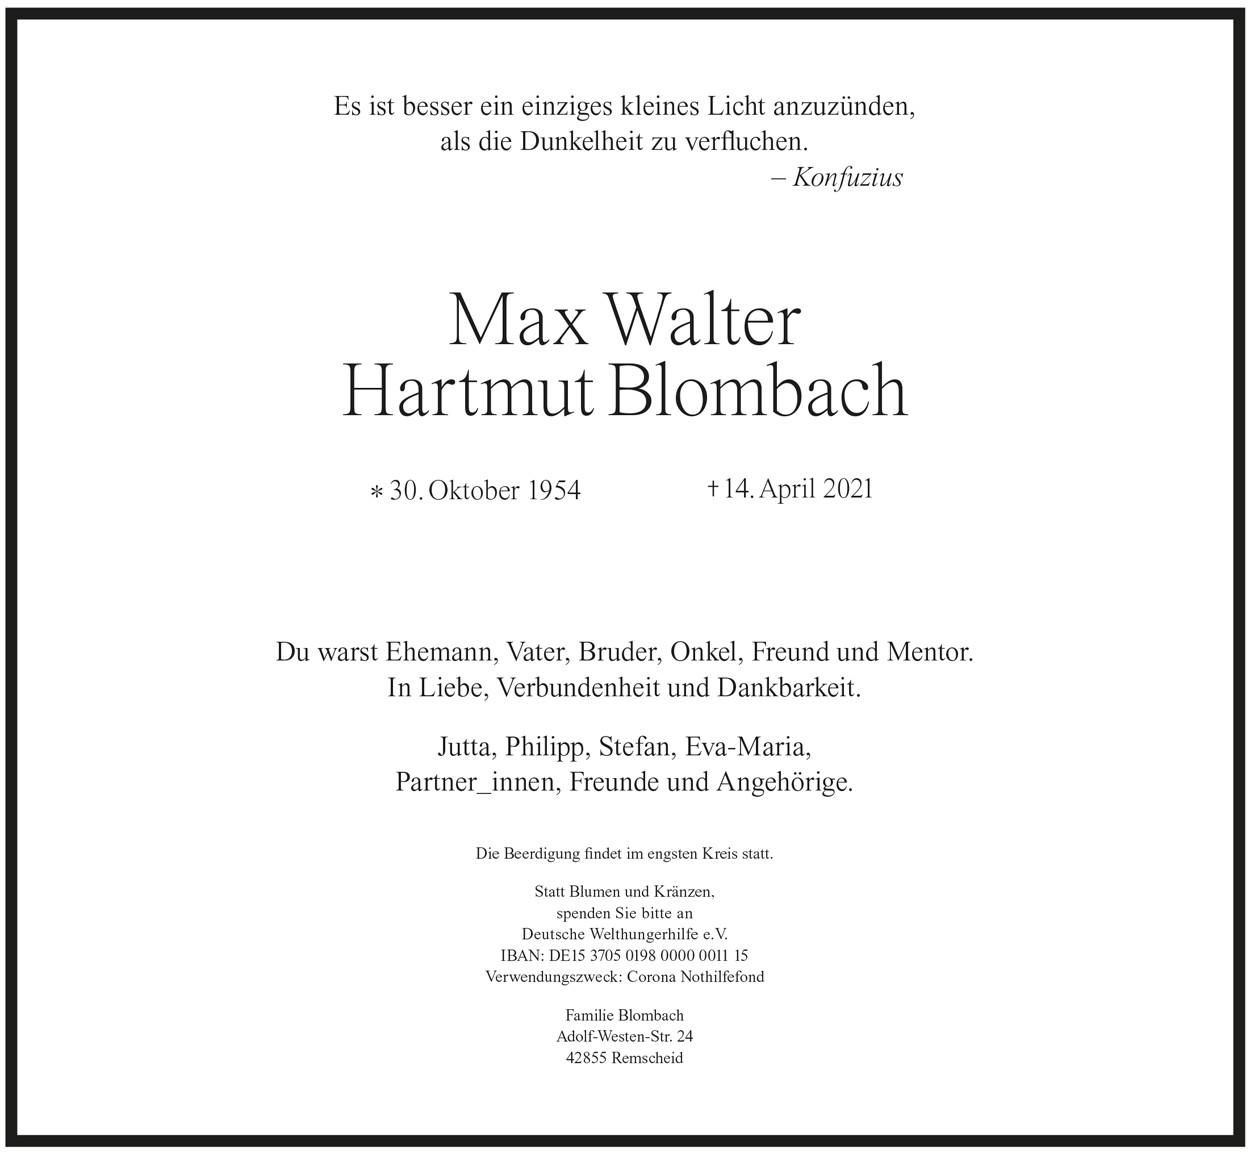 Max Walter Hartmut Blombach